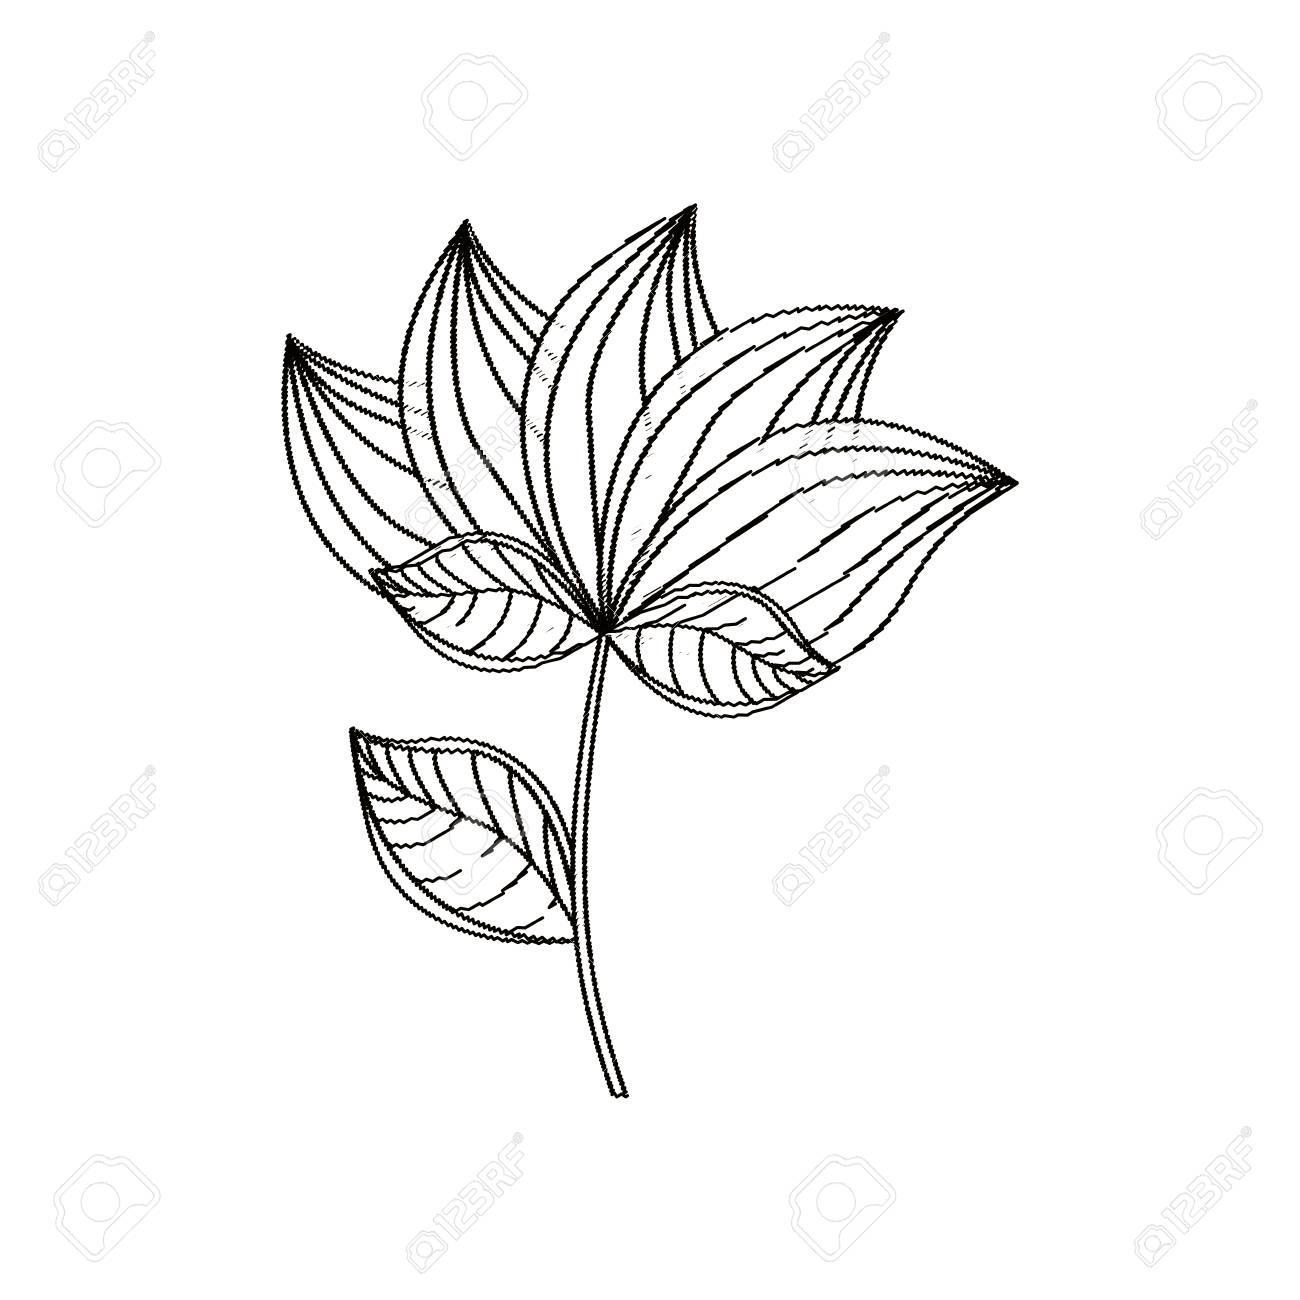 Lotus flower decoration sketch vector illustration eps 10 royalty lotus flower decoration sketch vector illustration eps 10 stock vector 73591448 izmirmasajfo